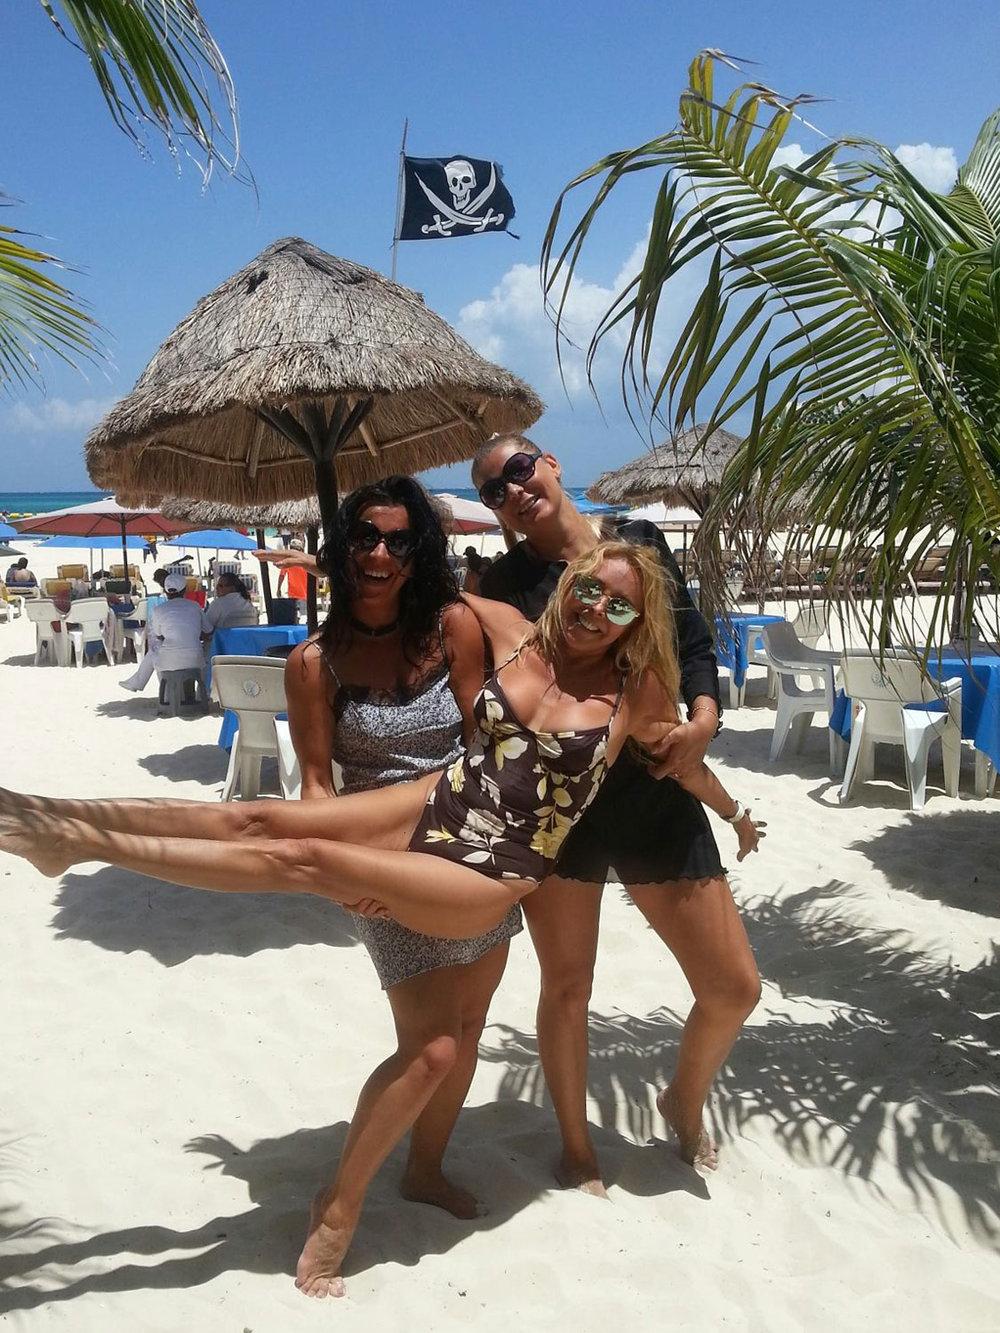 Hammocks_and_Ruins_Riviera_Maya_Mexico_Explore_What_to_Do_Yucatan_Playa_del_Carmen_Best_Beaches_2.jpg